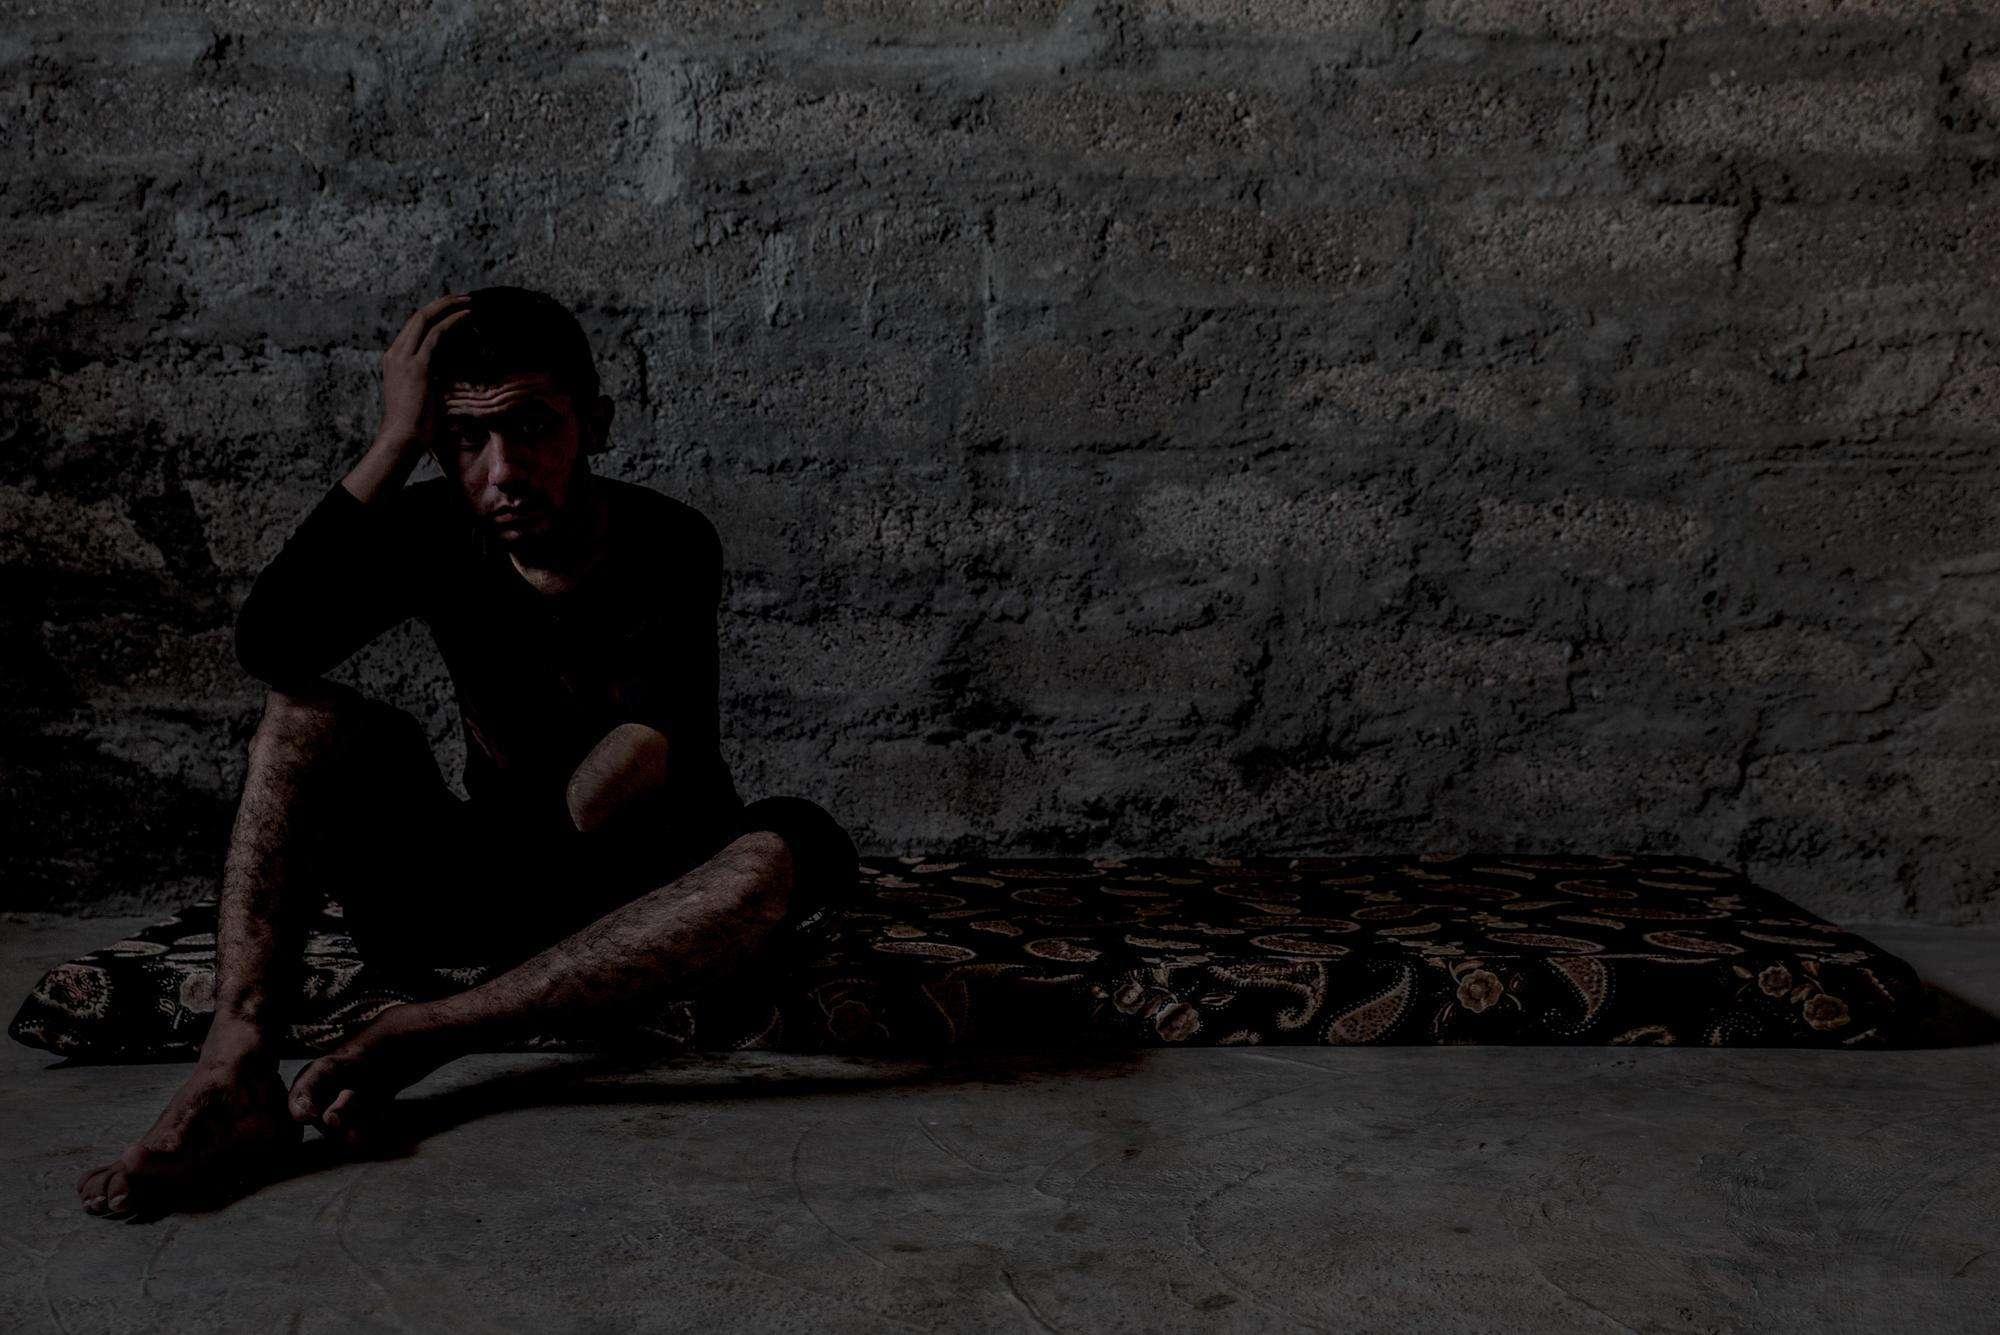 Iraq: Yazidi survivors of violence are facing a mental health crisis